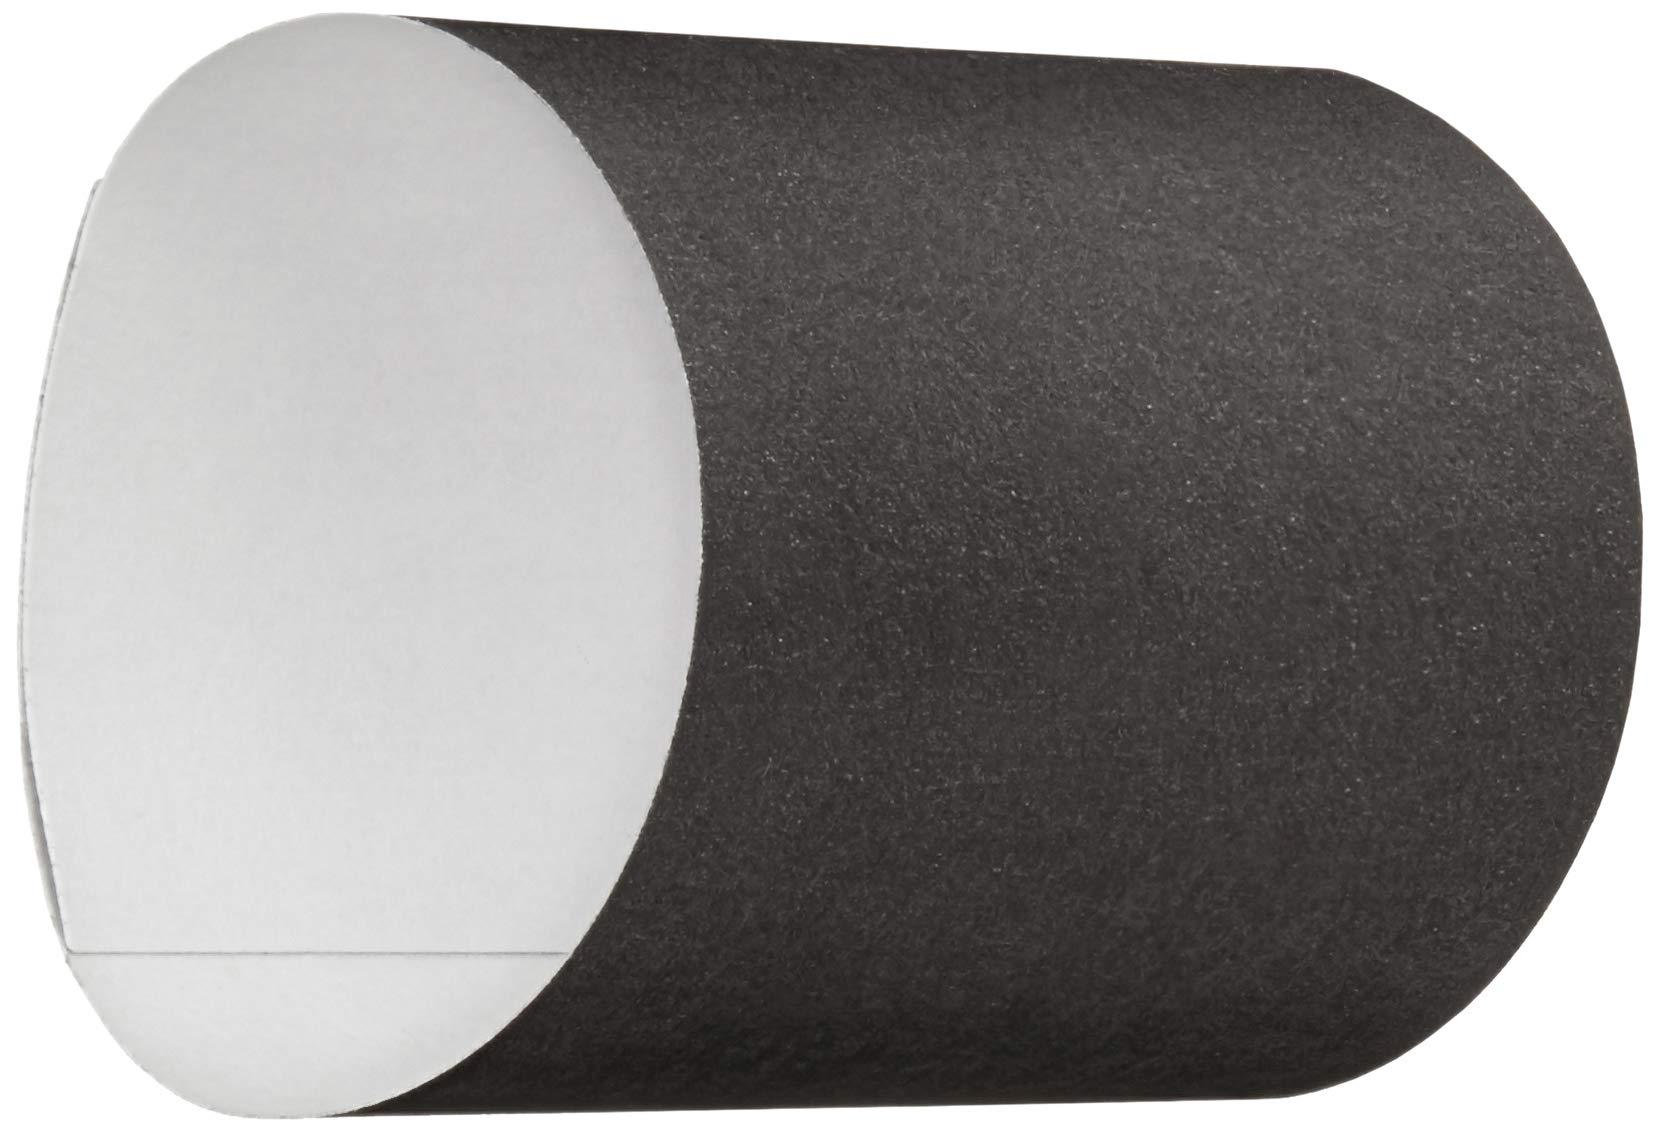 AmazonBasics Napkin Band, 4.25'' x 1.5'', Black, 5000-Count